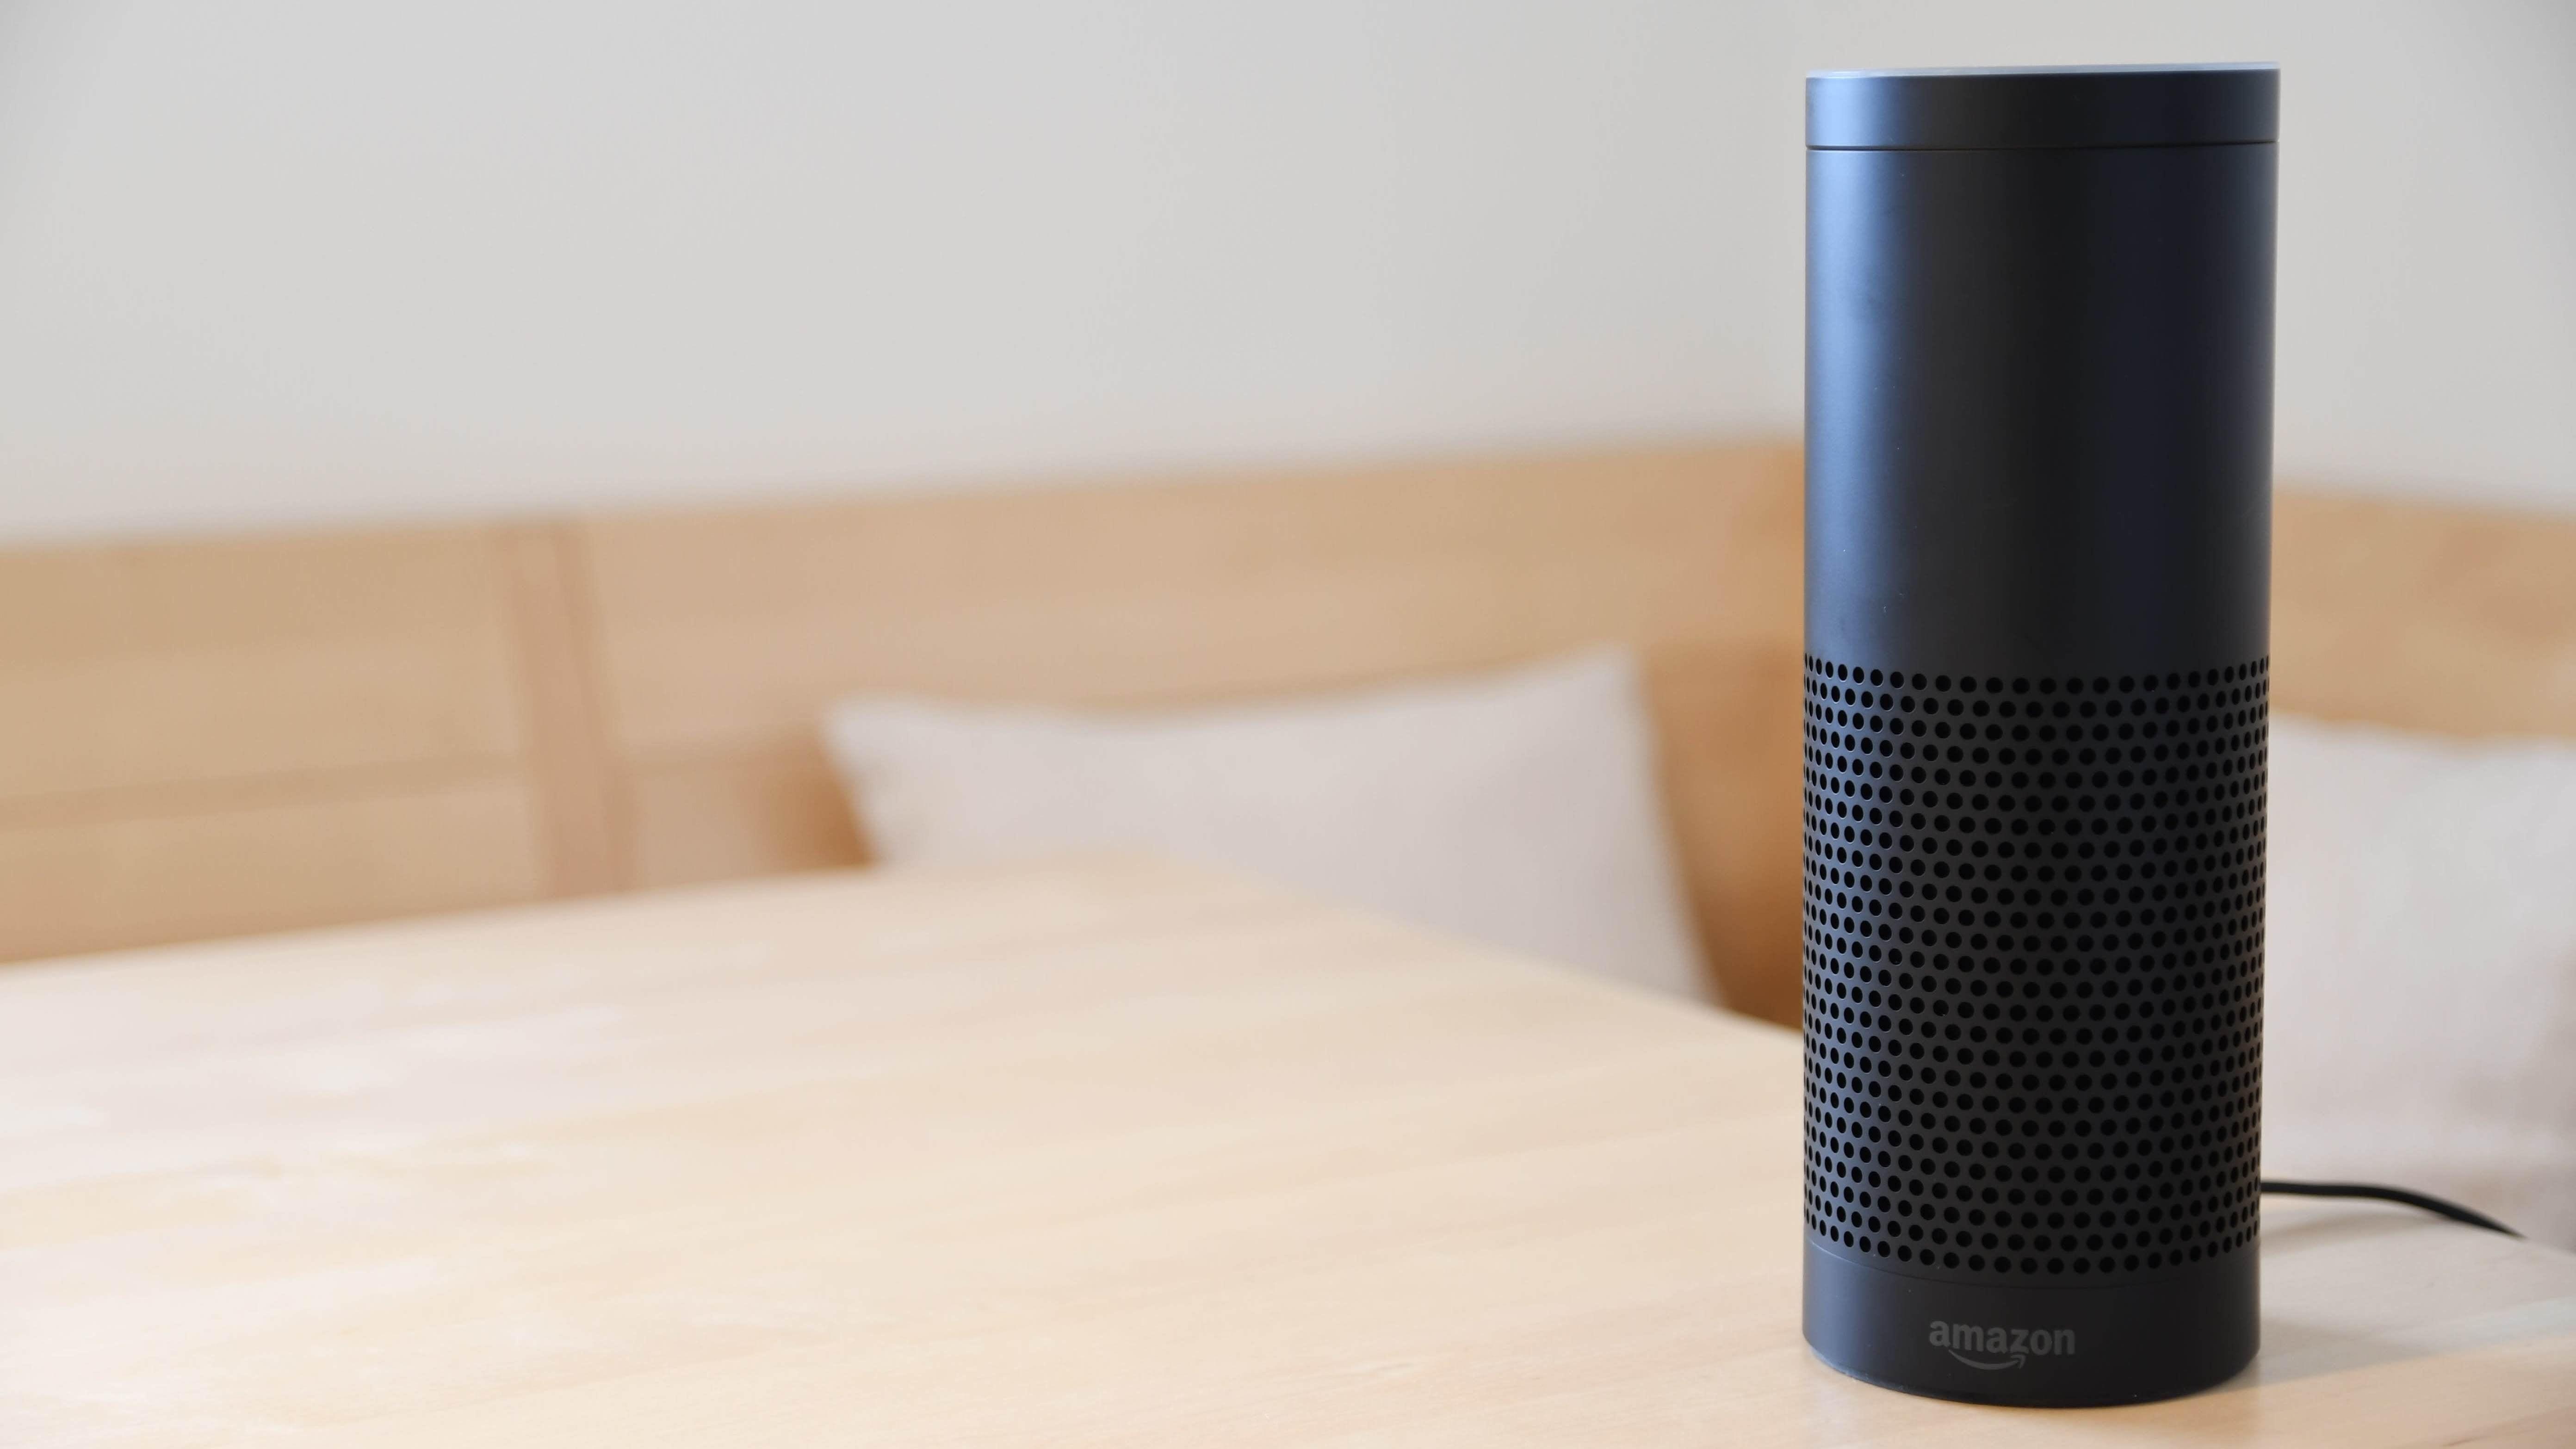 How To Stop Amazon Snooping On Your Alexa Conversations